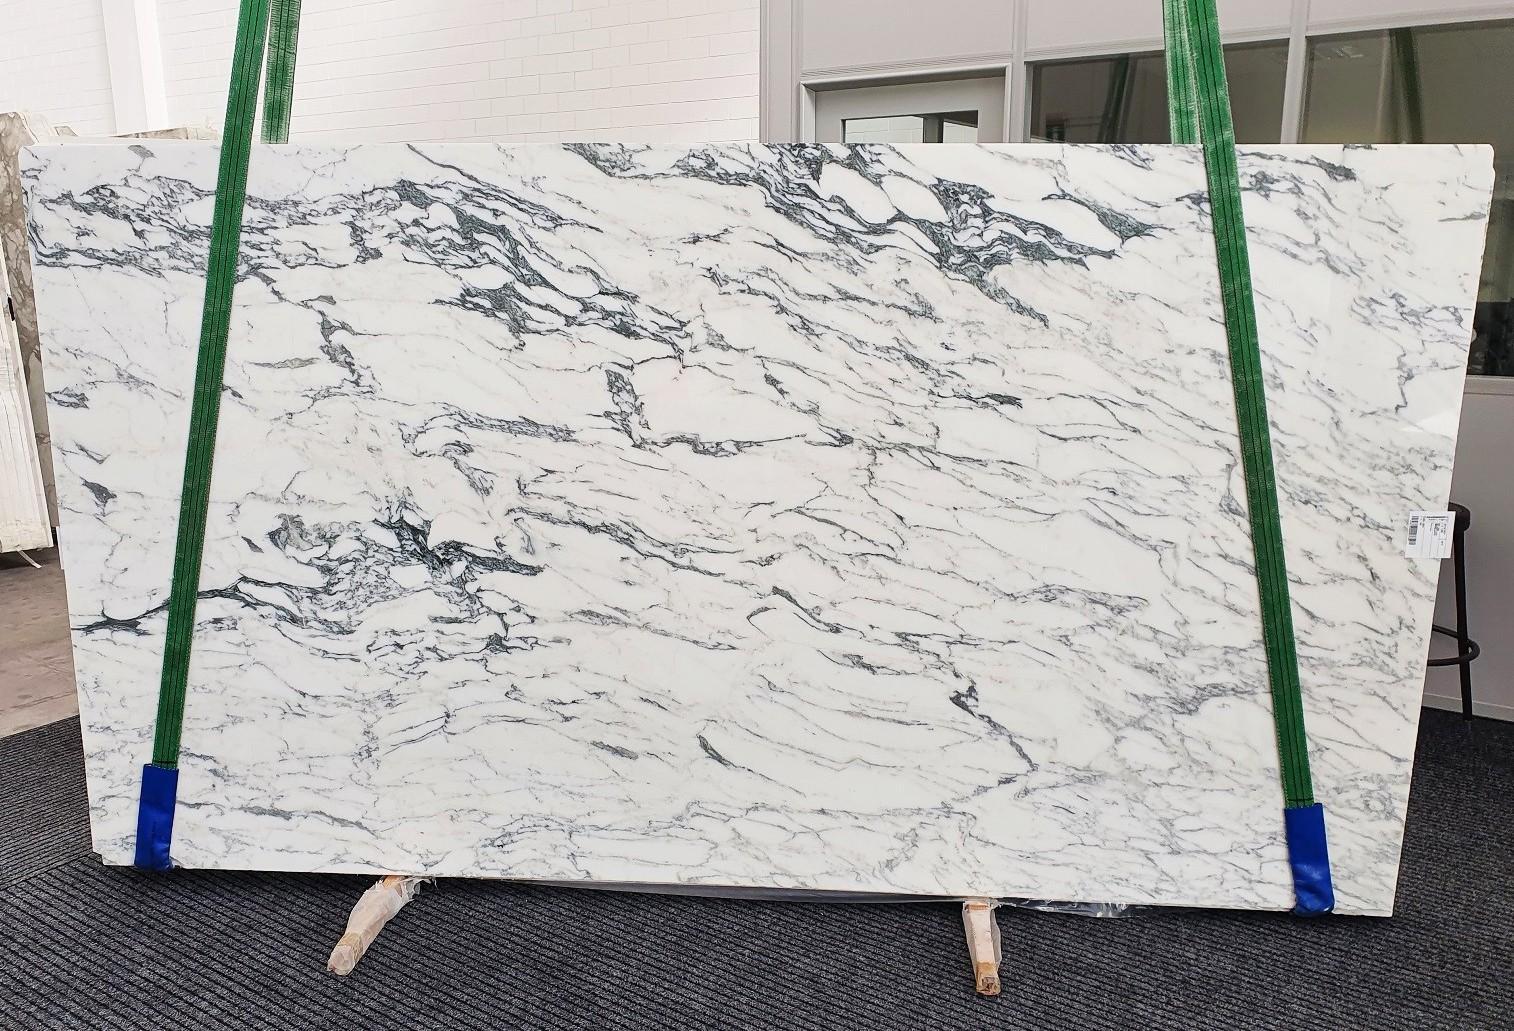 ARABESCATO FAINELLO Fourniture Veneto (Italie) d' dalles brillantes en marbre naturel 1356 , Slab #16